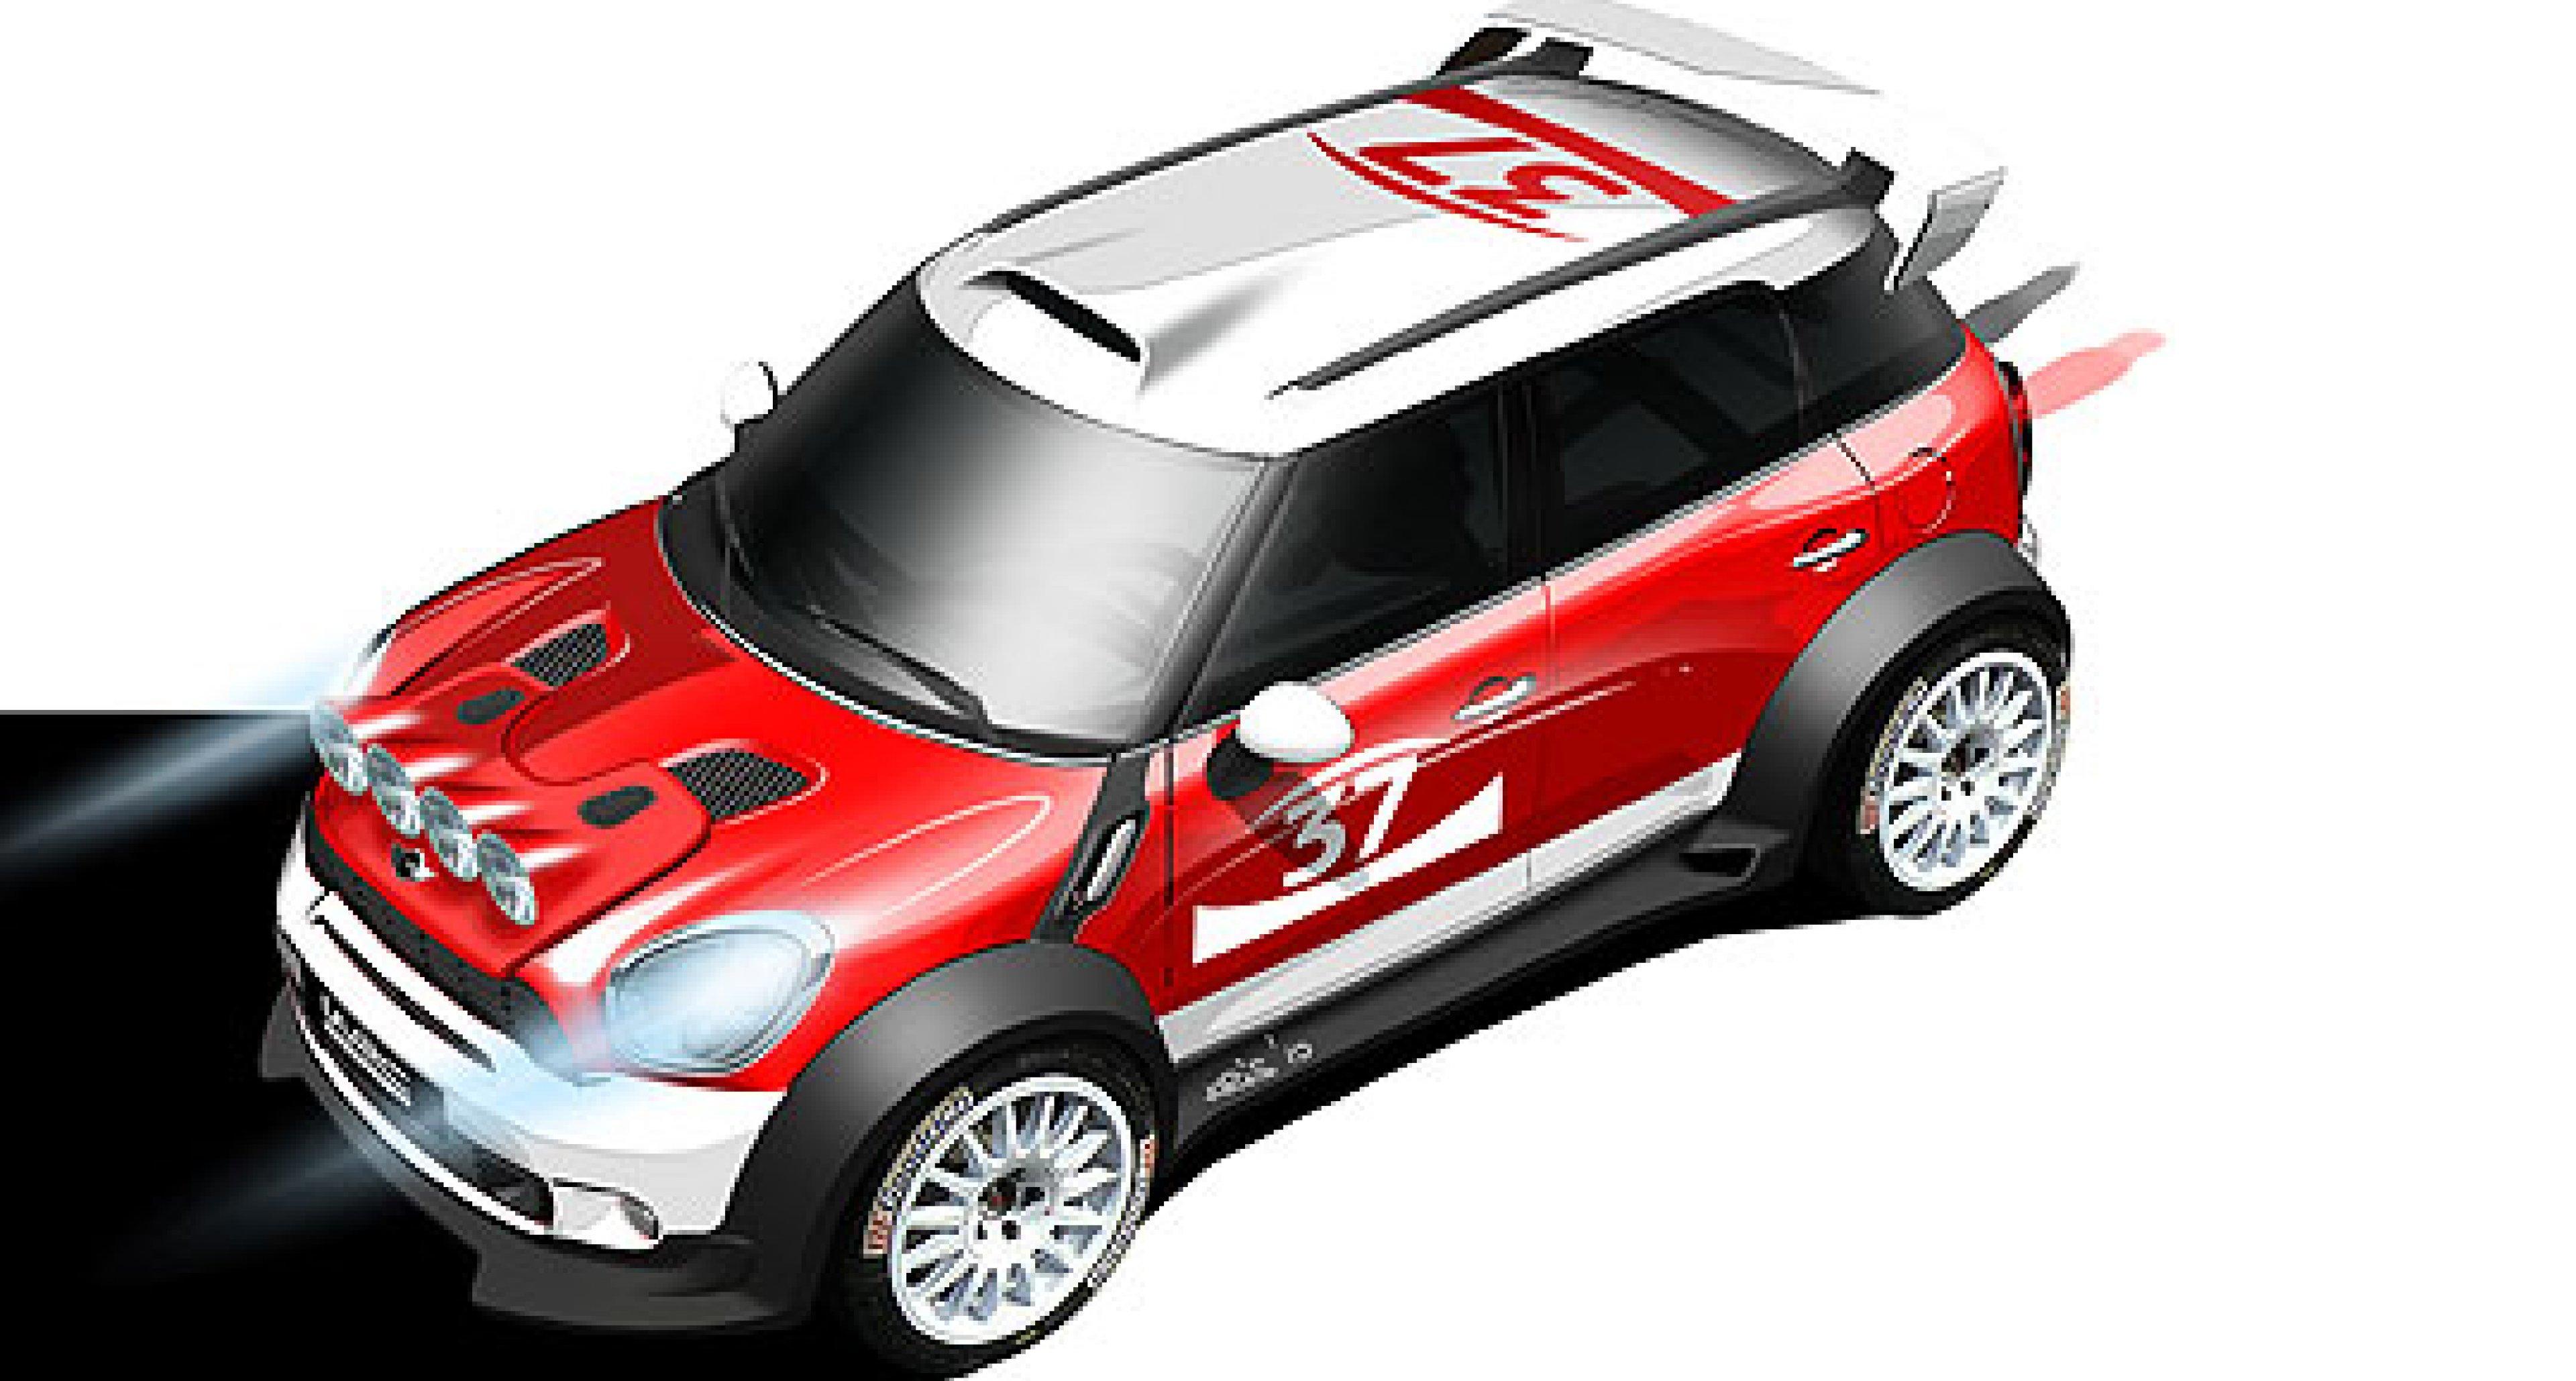 The Return of the Mini Rally Car